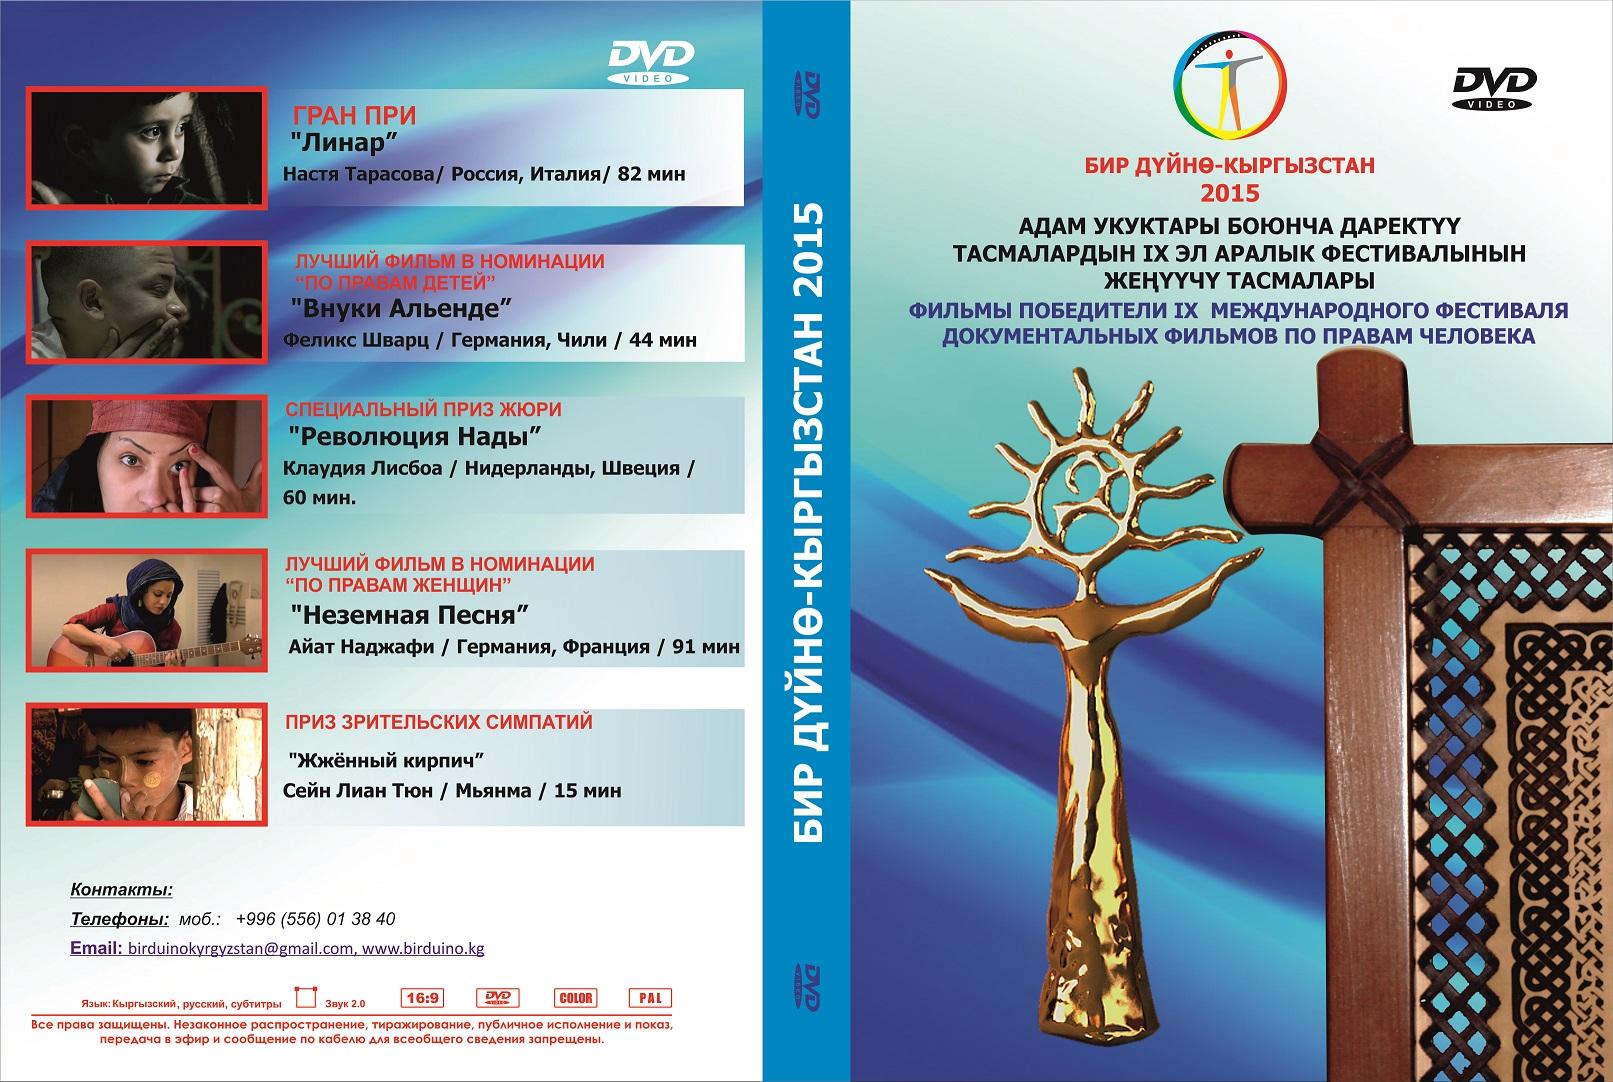 обложка-dvd